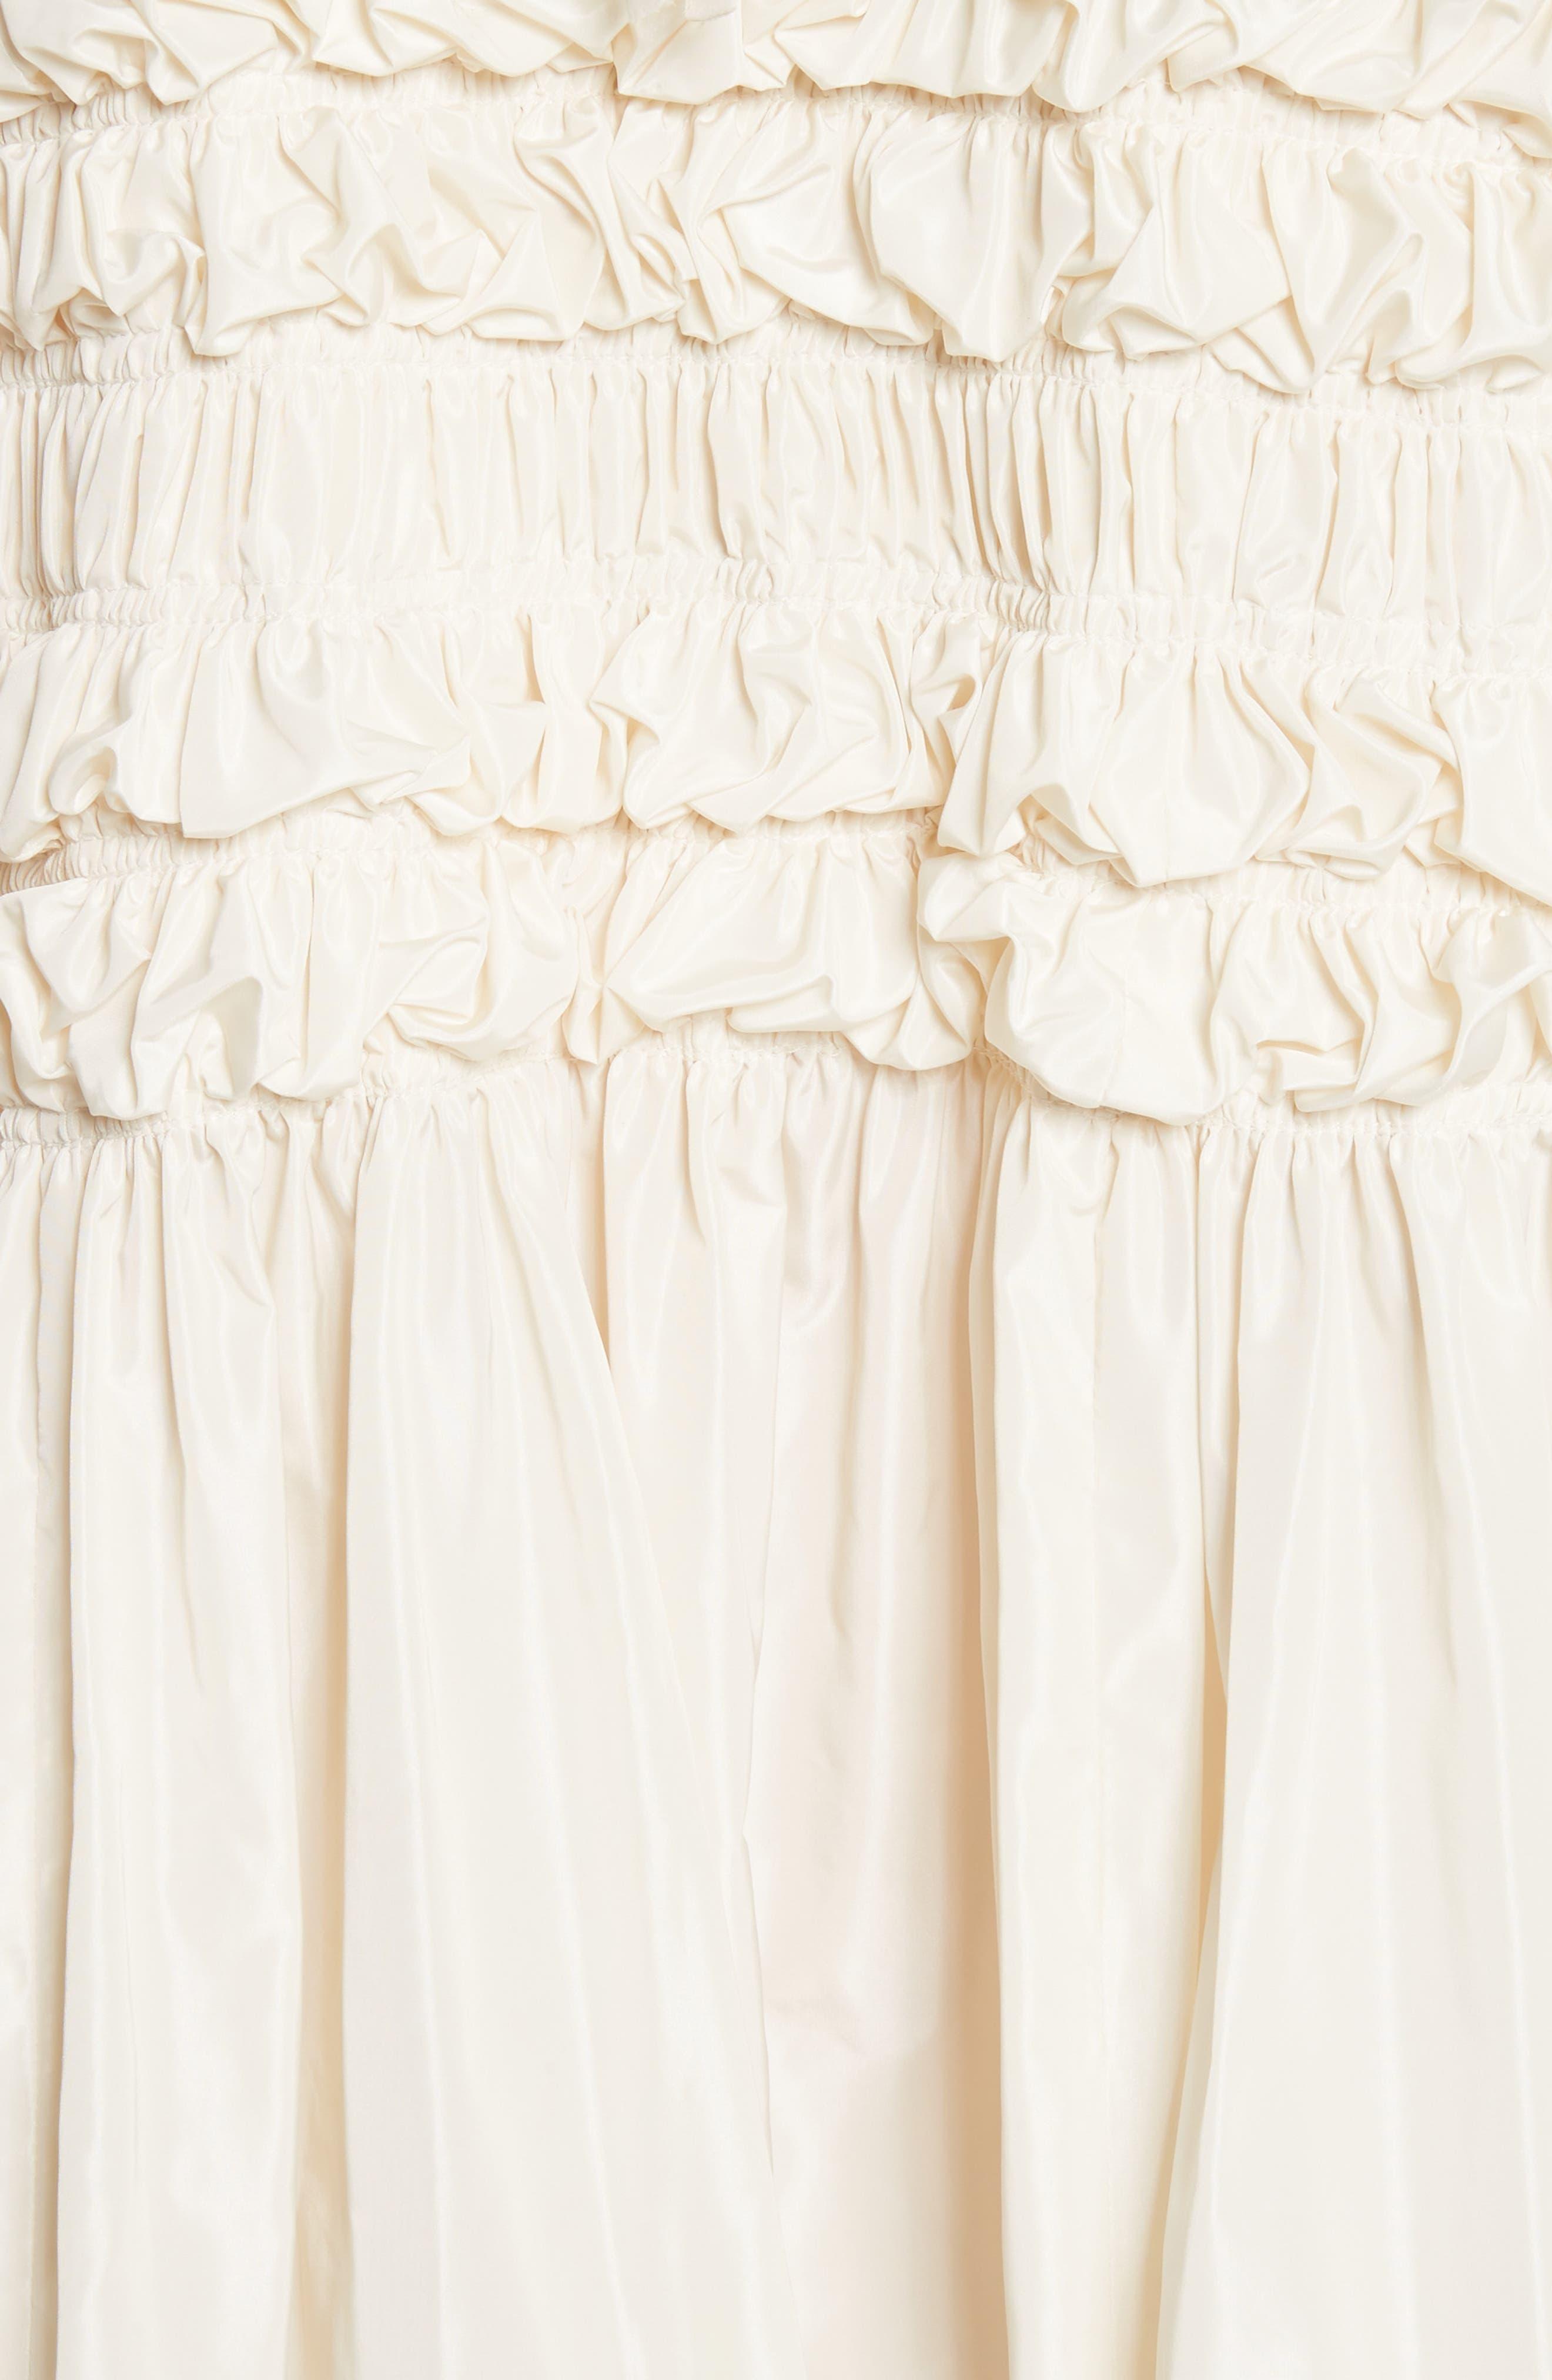 Lizzie Ruffled Taffeta Dress,                             Alternate thumbnail 5, color,                             900